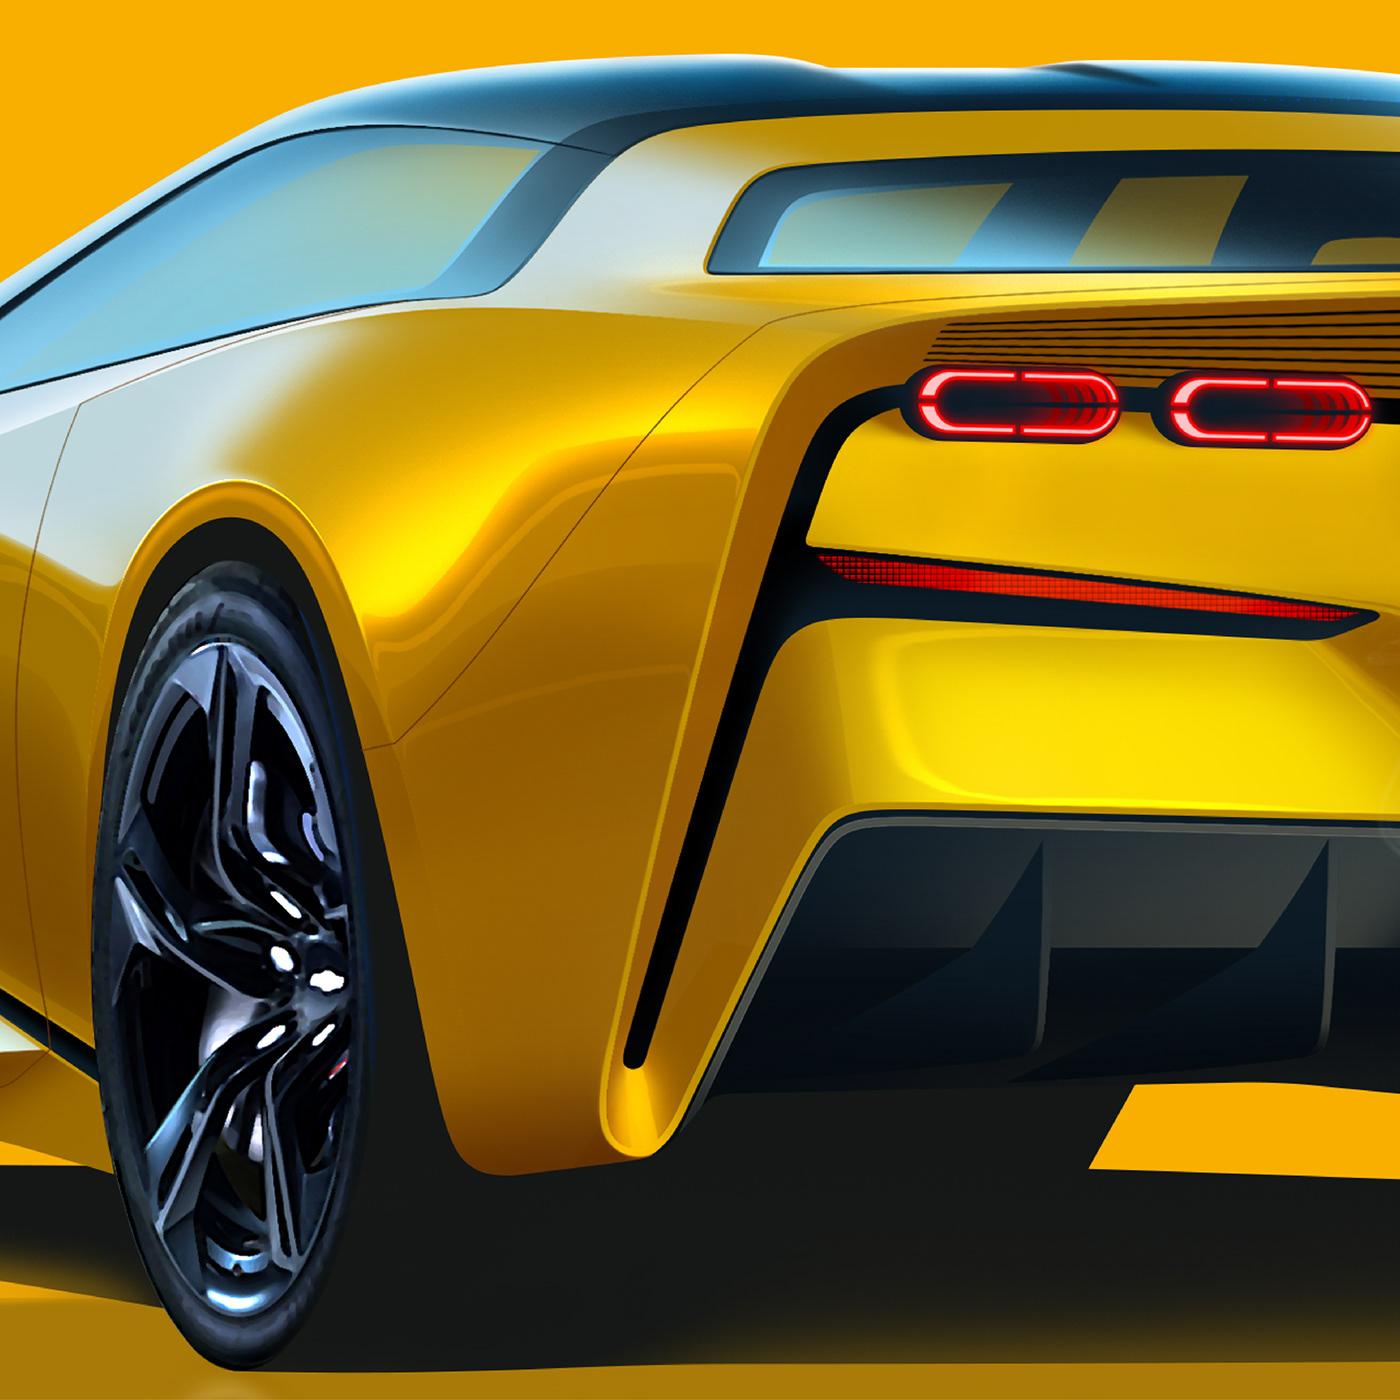 american autodesign car cardesign chevrolet Corvette rendering sketch Sportscar transportation